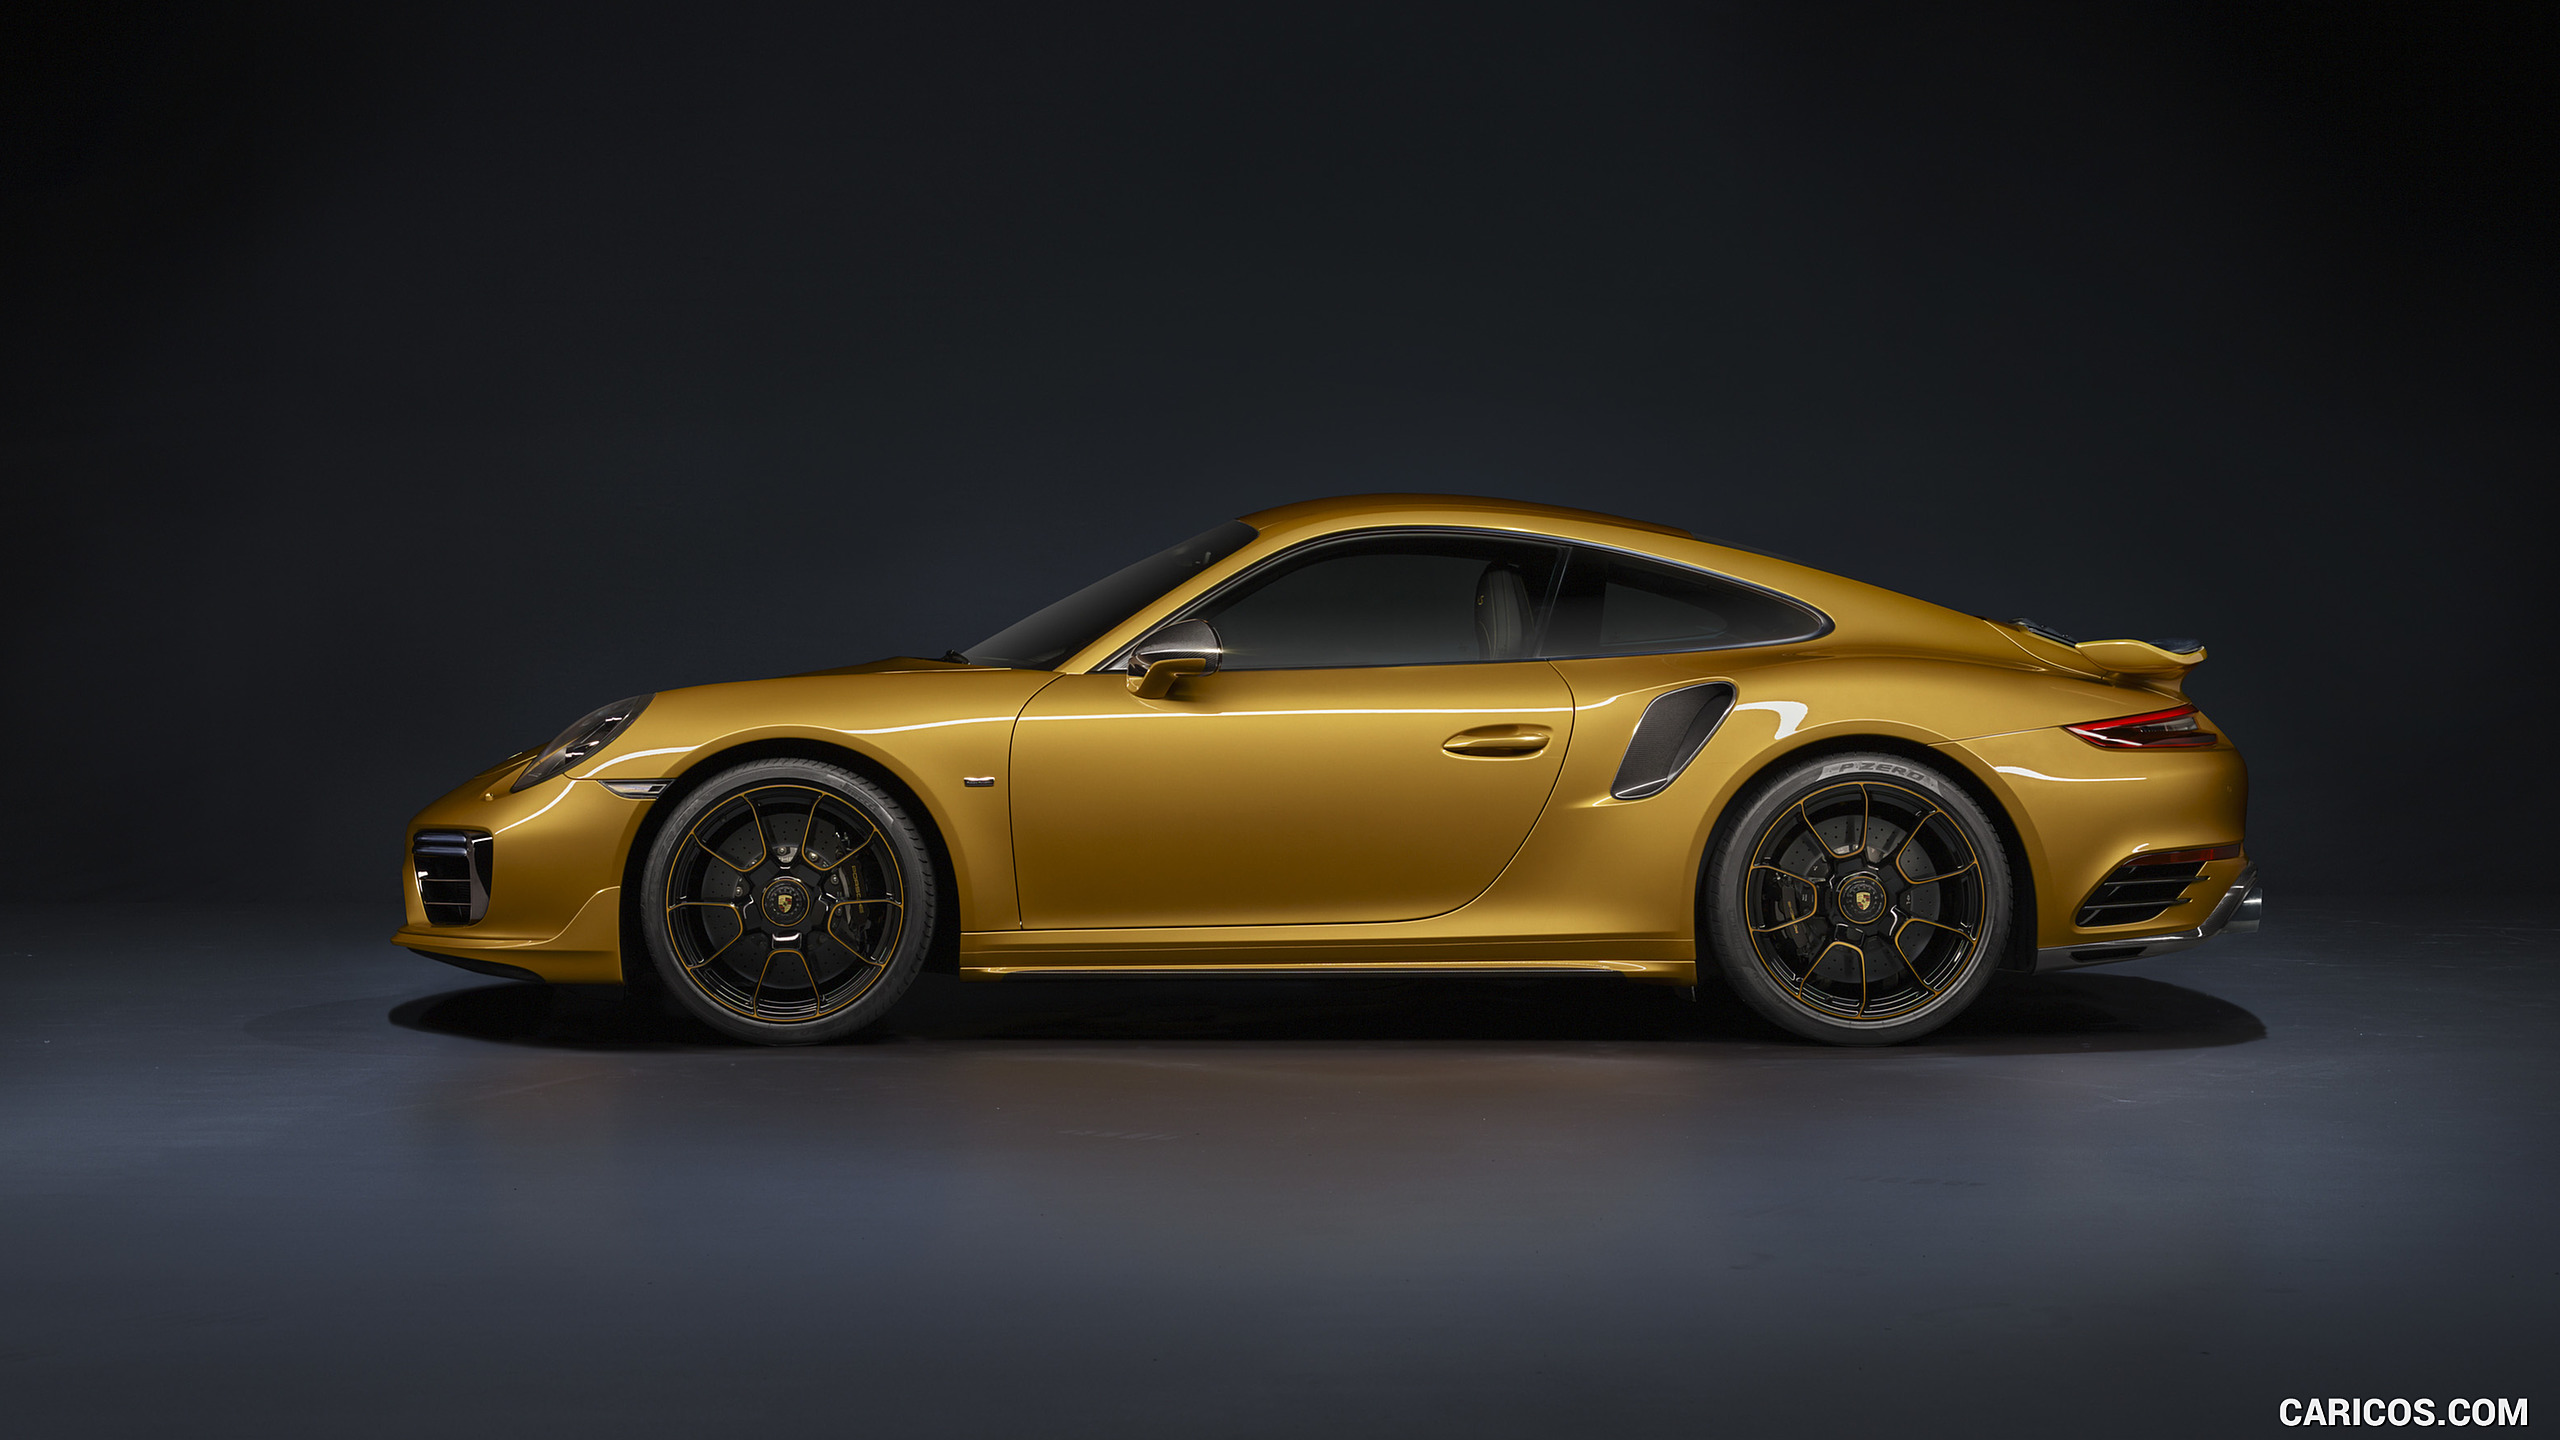 30 Porsche 911 Turbo S Wallpapers On Wallpapersafari